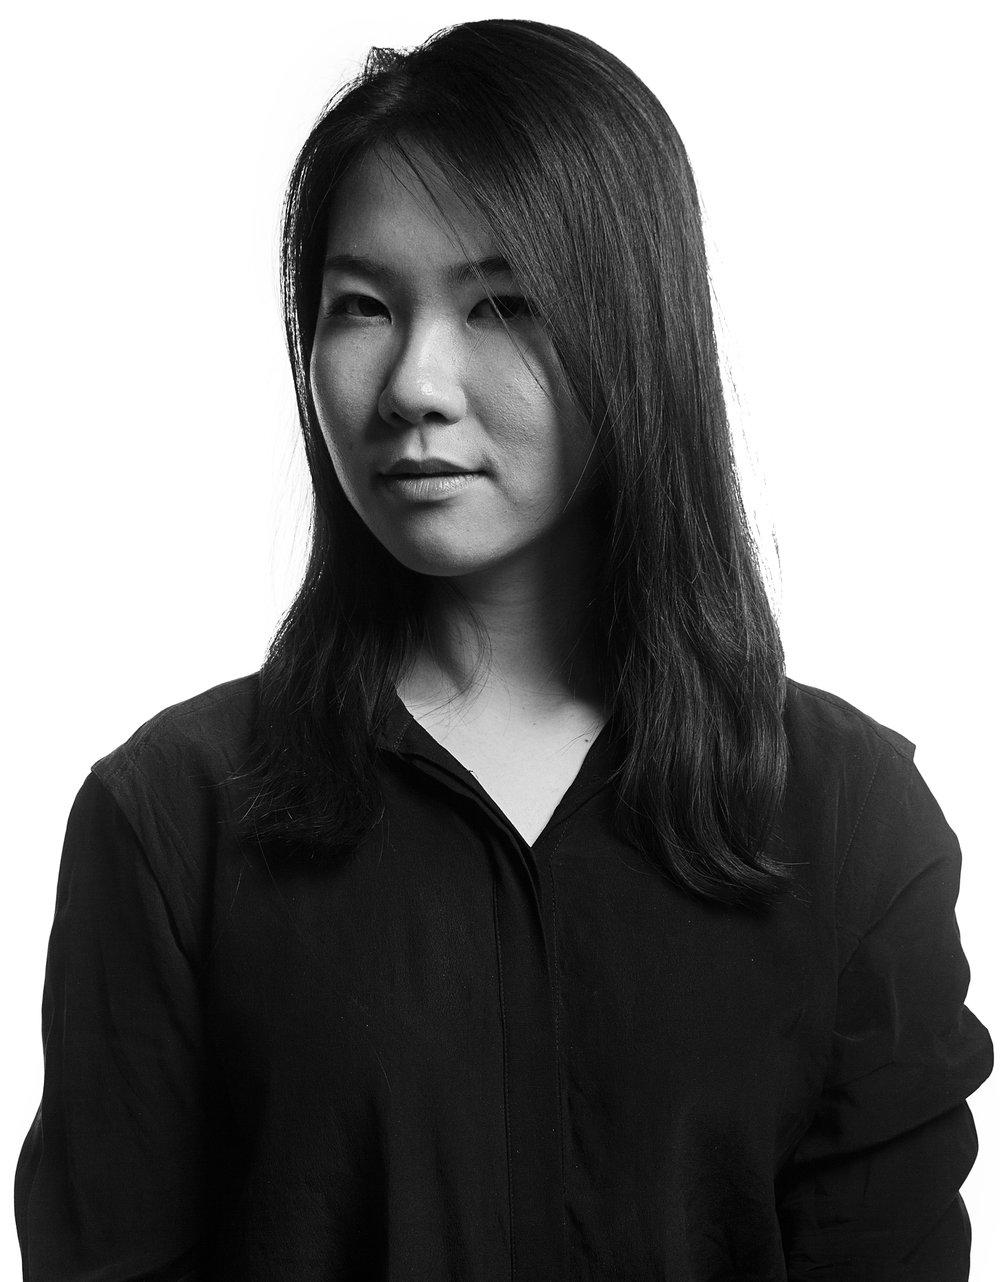 ACCD_Enviro_435-grads-in-studio-portraits-corporate.jpg